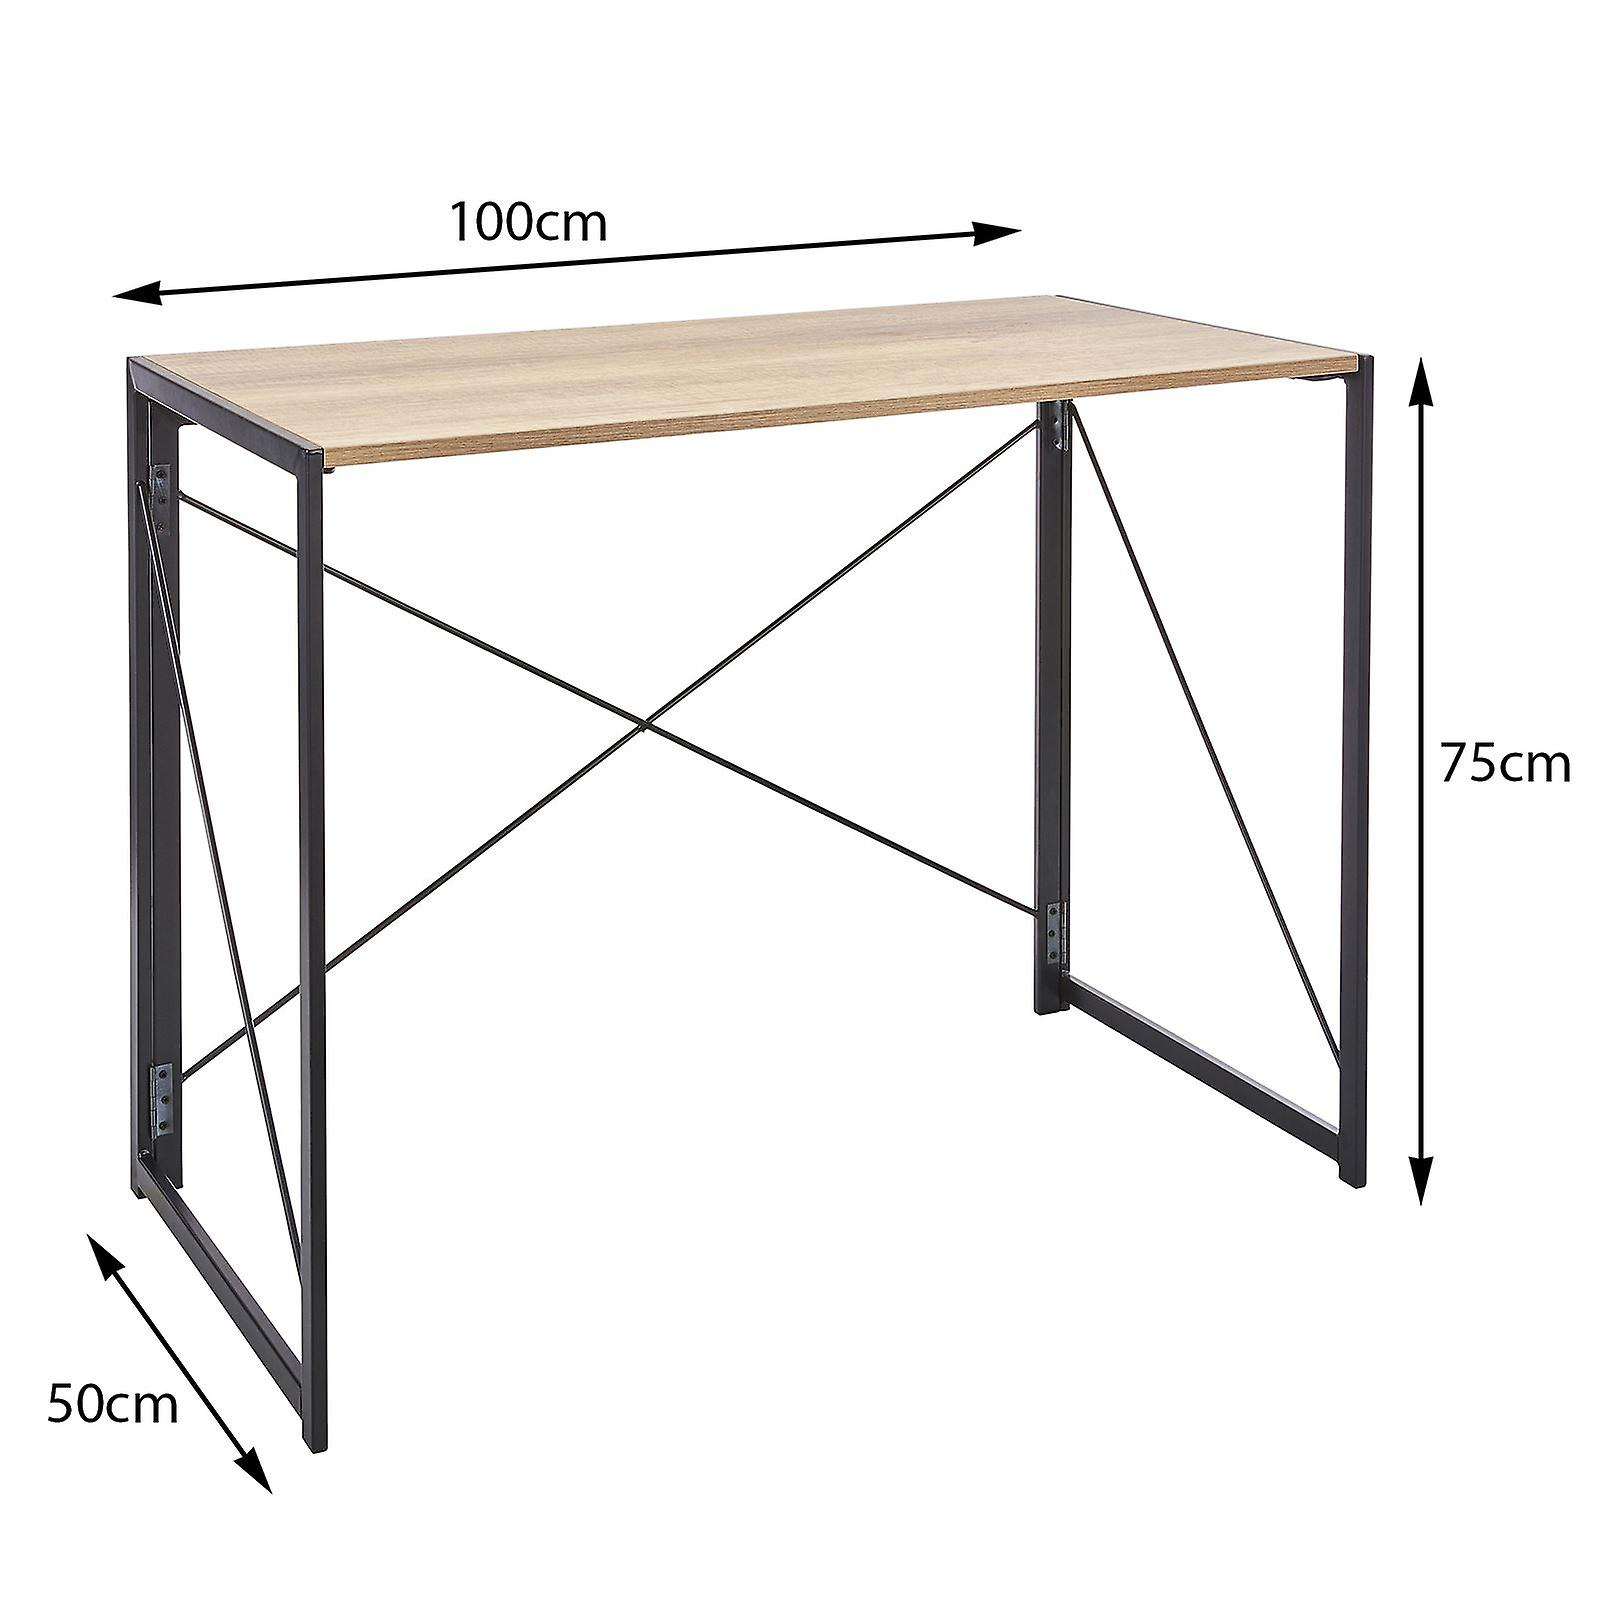 Folding Table In Black Powder Coating